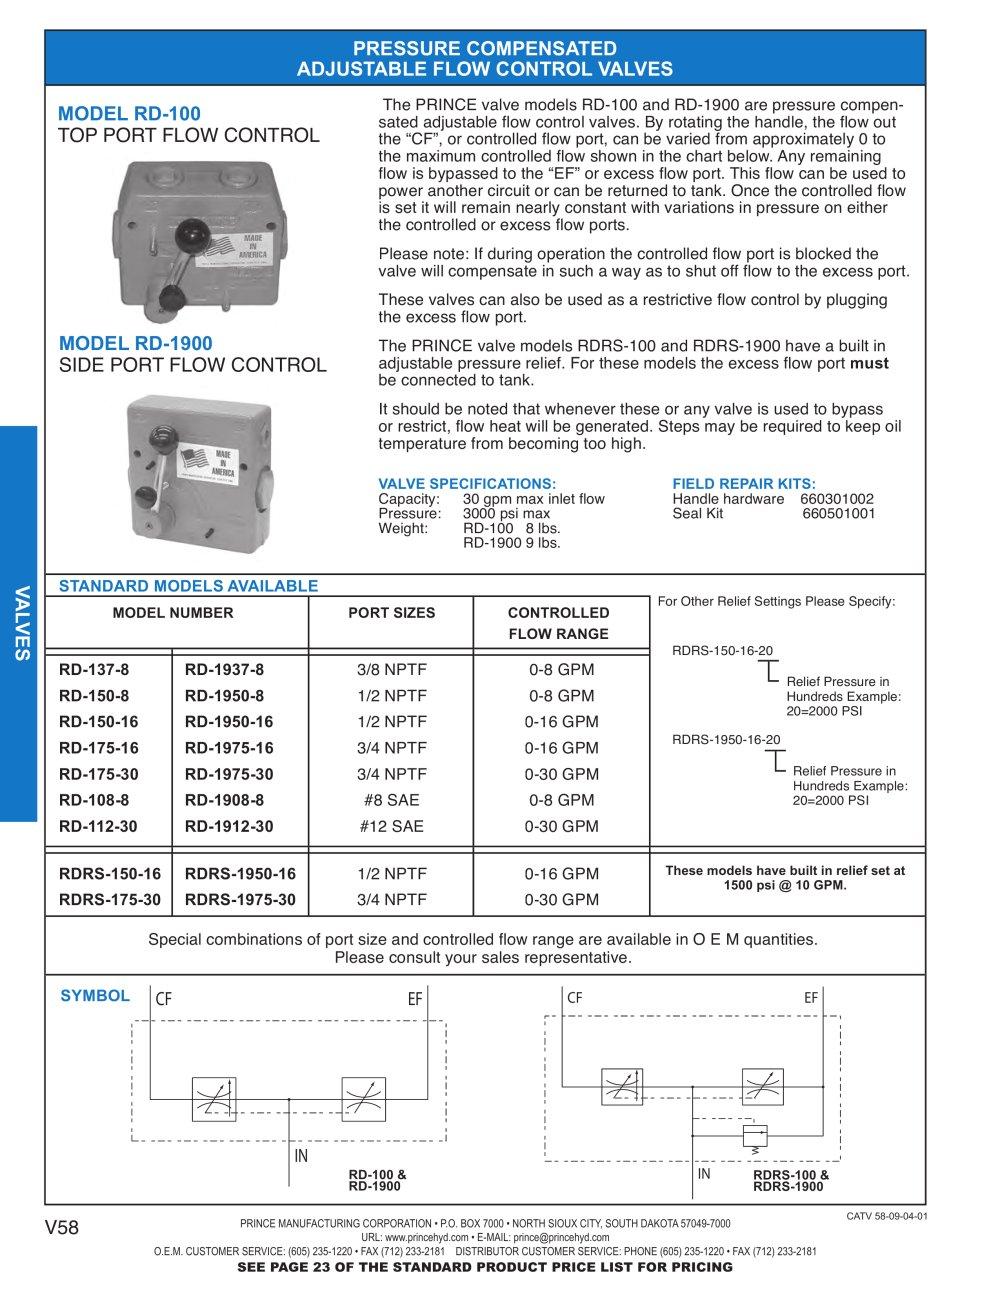 Model rd 100 adjustable flow control valve prince pdf model rd 100 adjustable flow control valve 1 2 pages nvjuhfo Choice Image